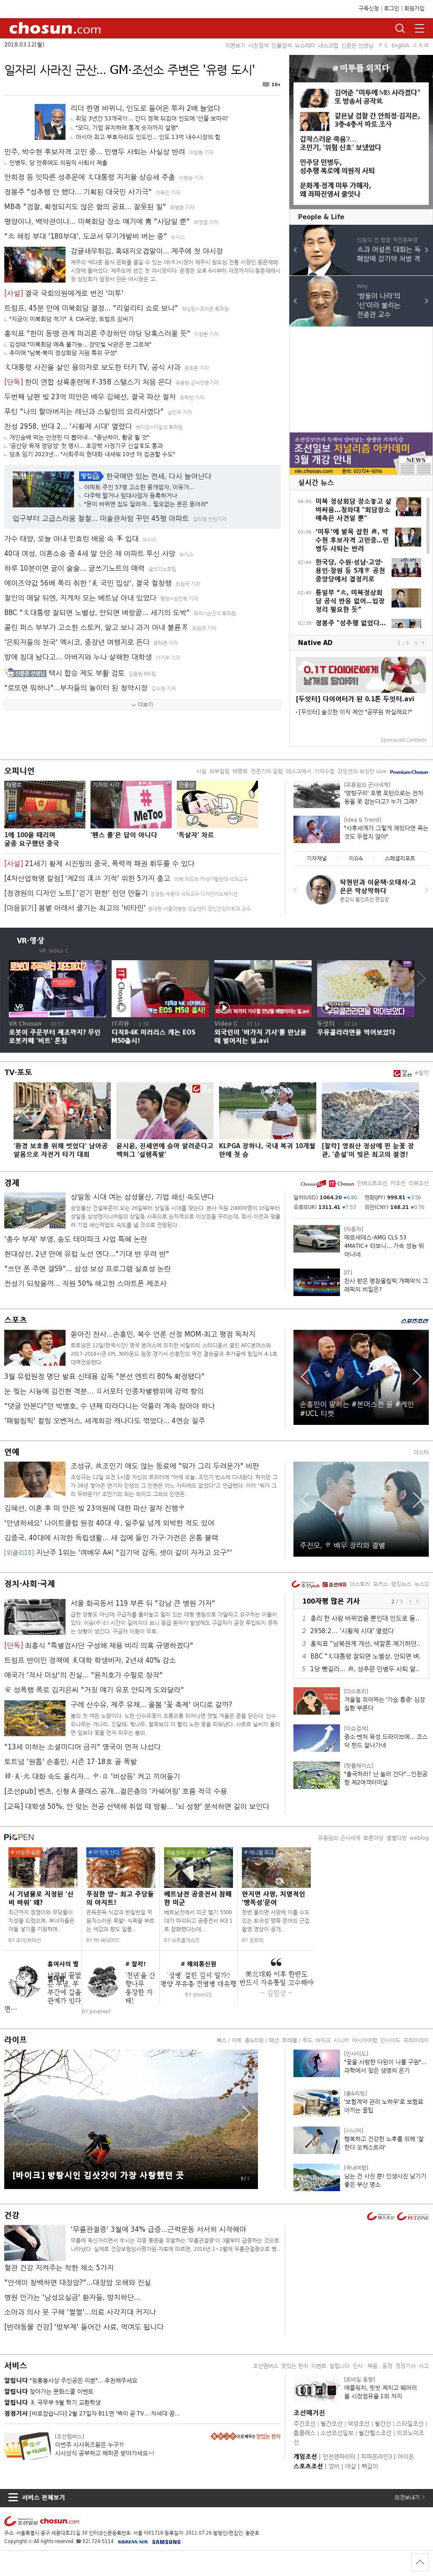 chosun.com at Monday March 12, 2018, 5:03 a.m. UTC